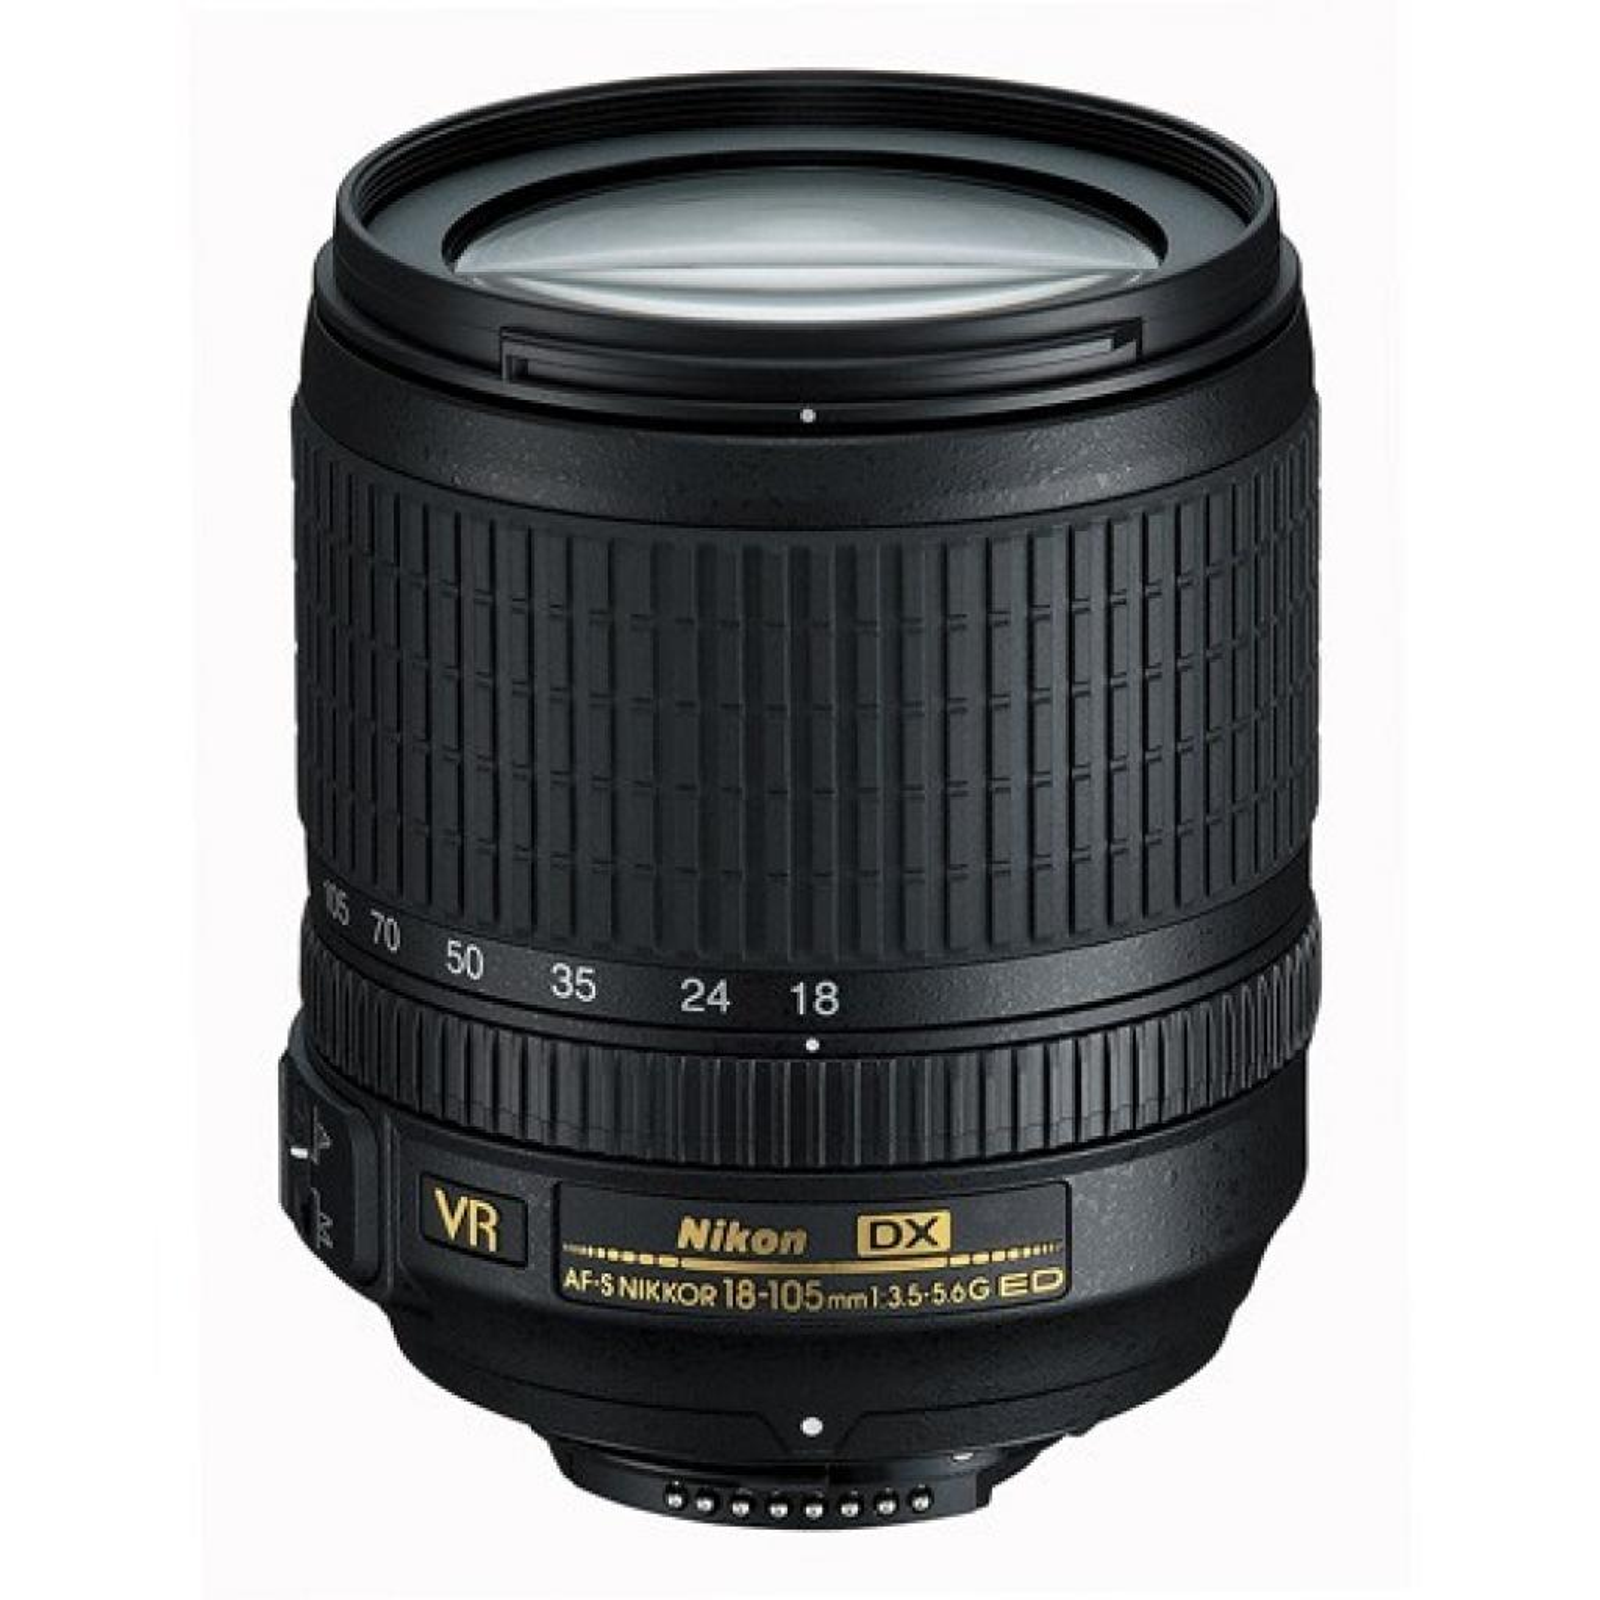 Объектив AF-S 18-105mm f/3.5-5.6G ED VR DX Nikon (JAA805DA) изображение 2